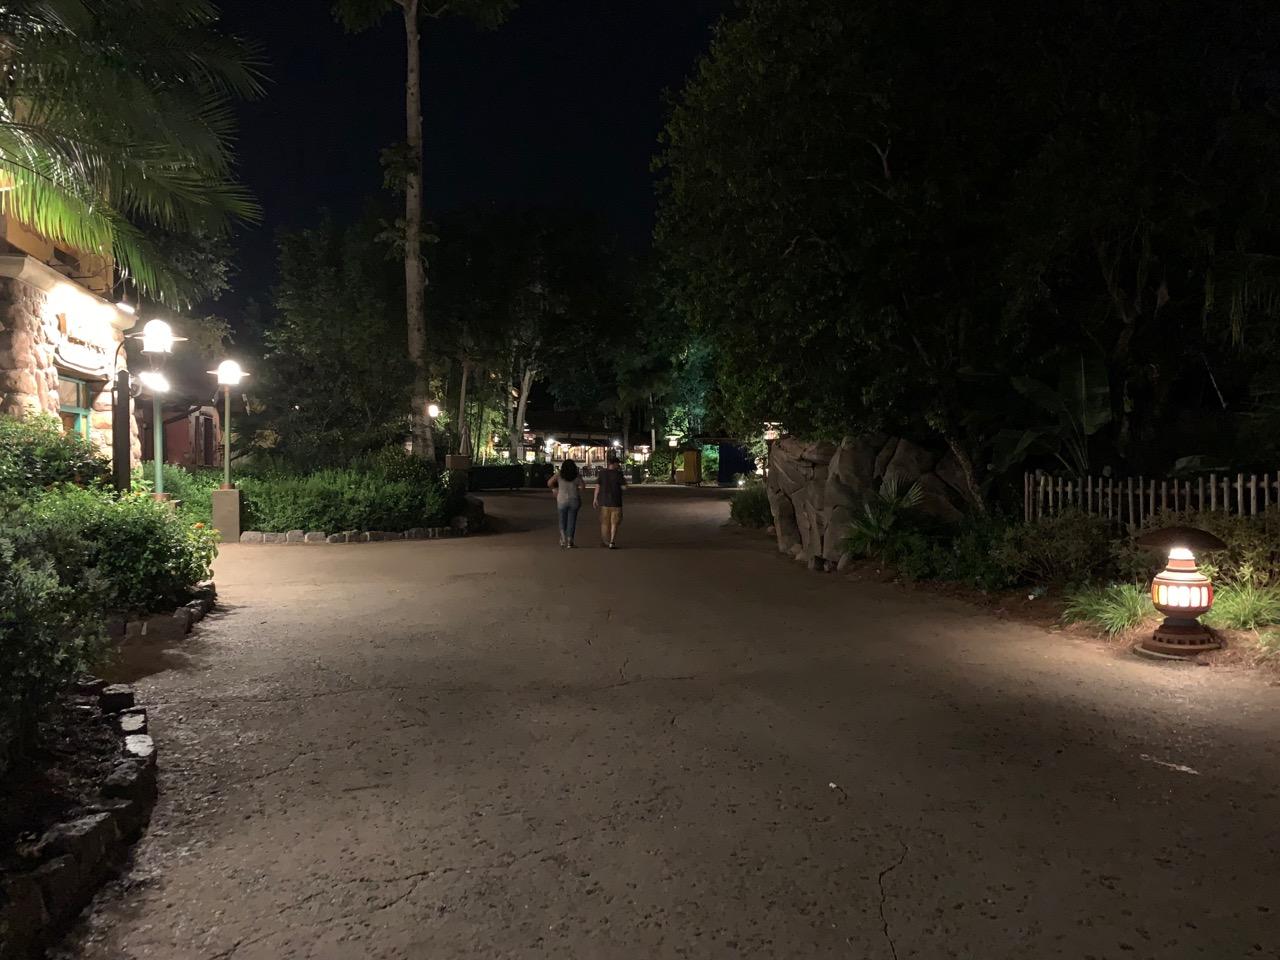 disney world animal kingdom after hours 16 empty.jpeg